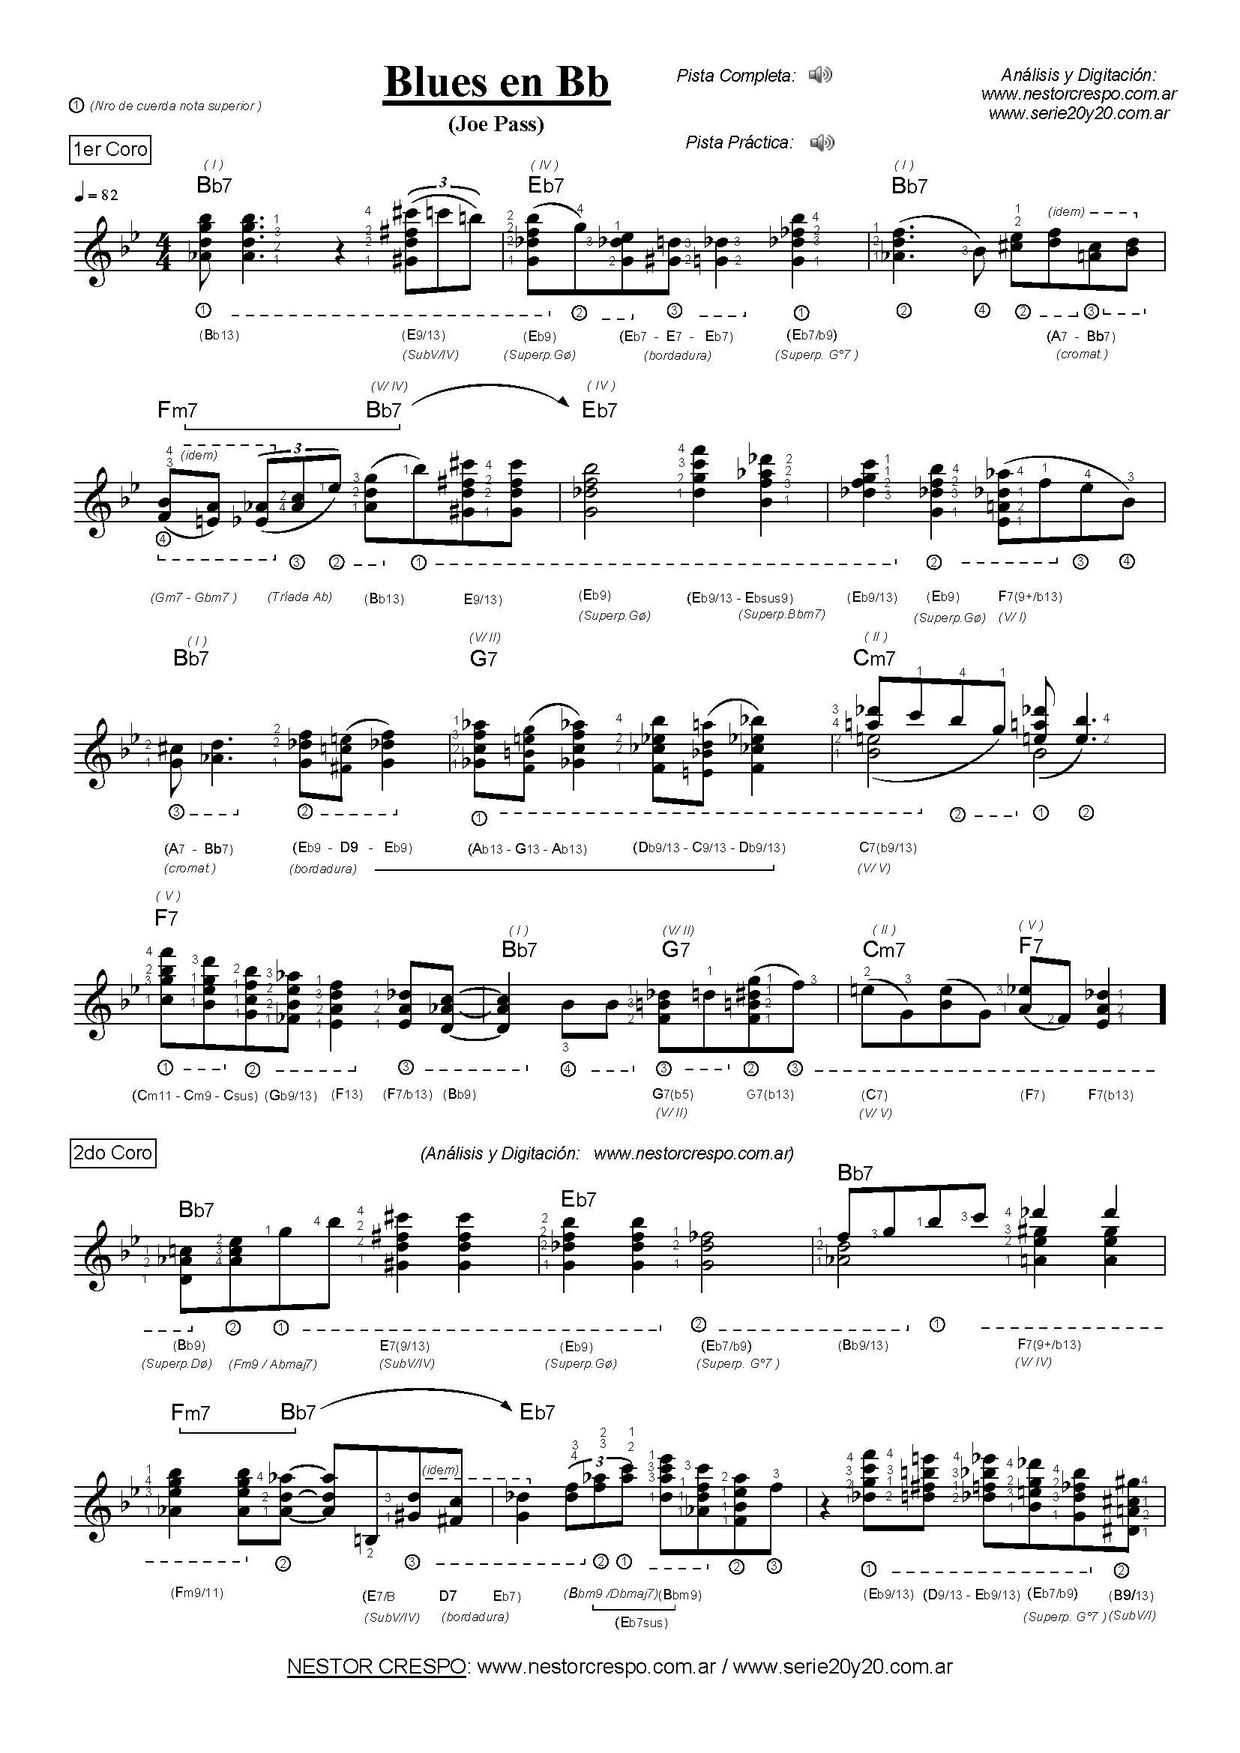 GUITARRA / Joe Pass  - Solo con acordes sobre Blues en Bb